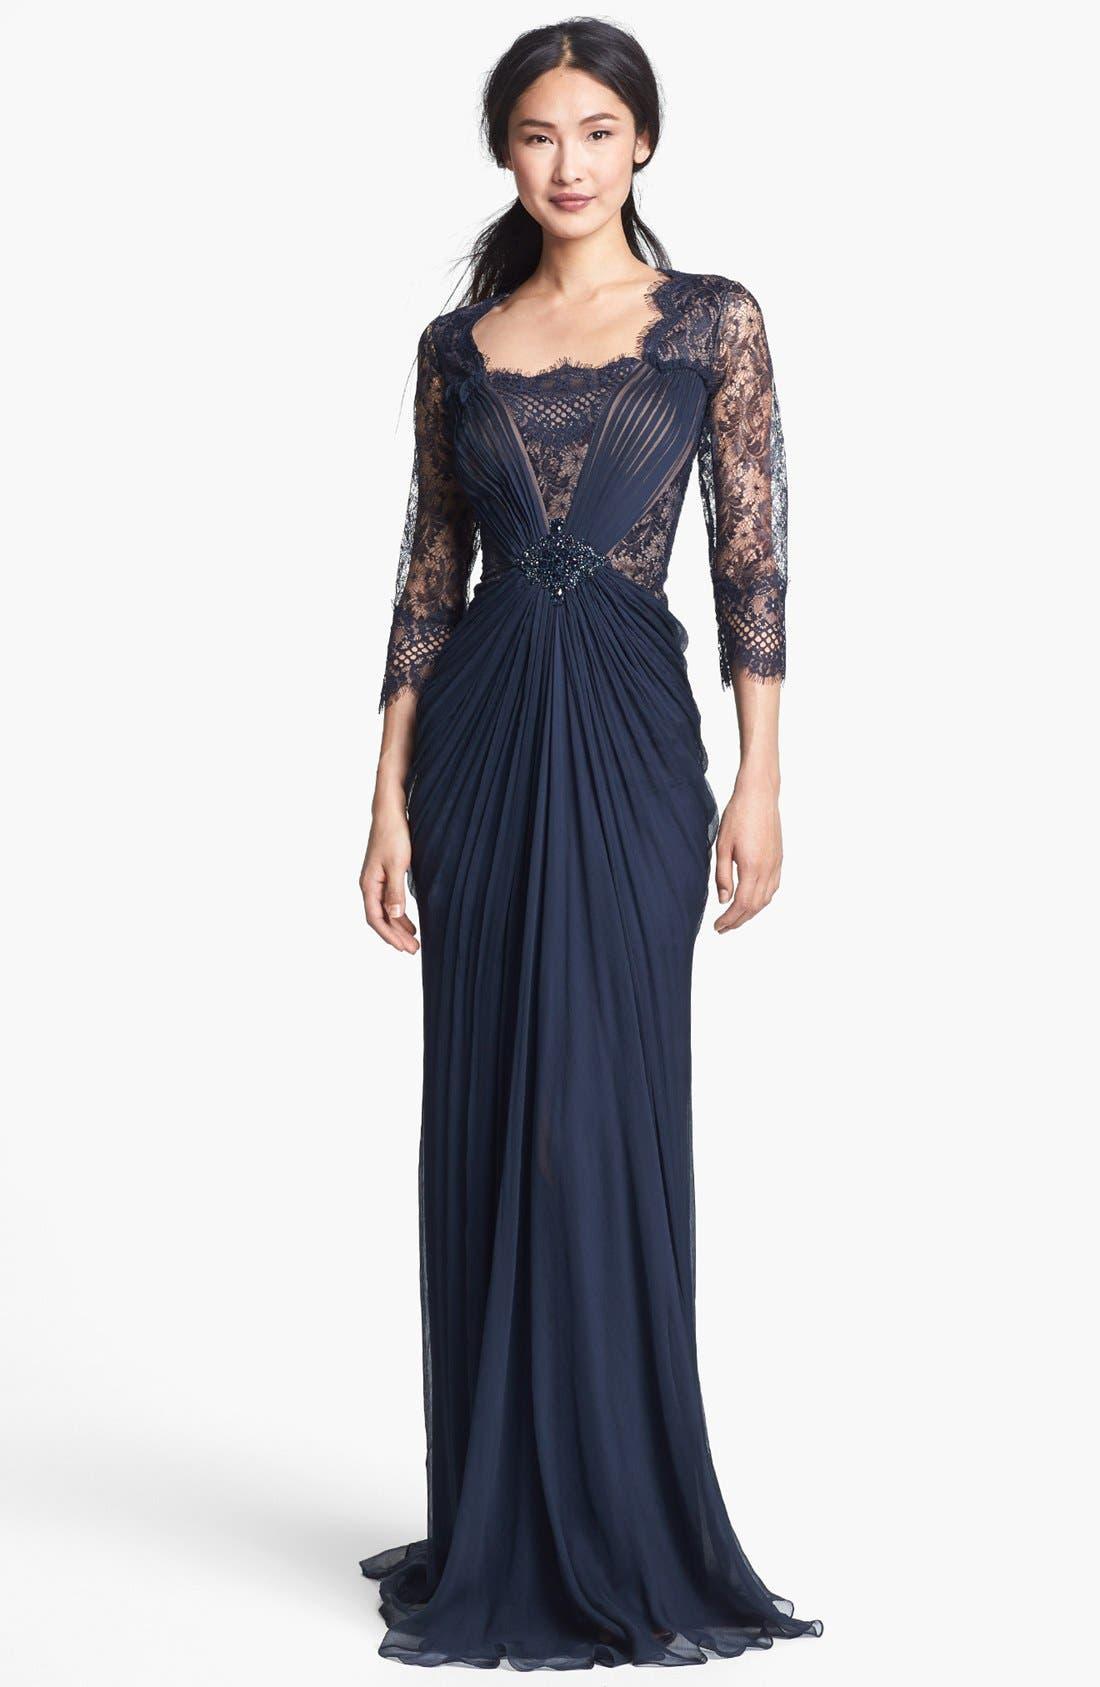 Alternate Image 1 Selected - Tadashi Shoji Embellished Lace & Silk Chiffon Gown